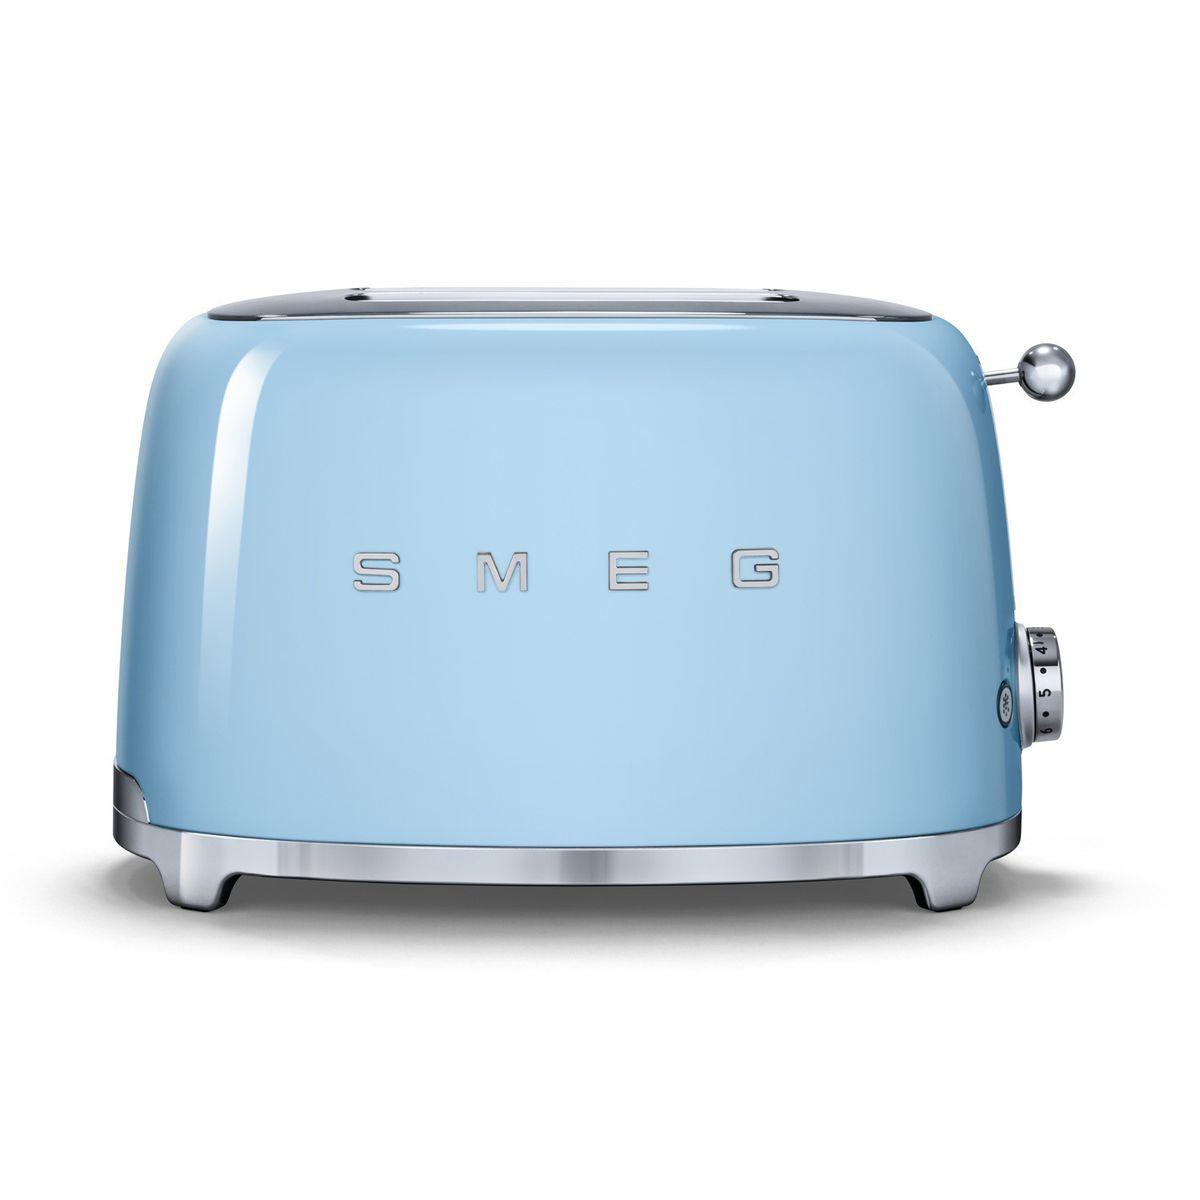 Smeg 2 Slice Toaster Pastel Blue TSF01PB